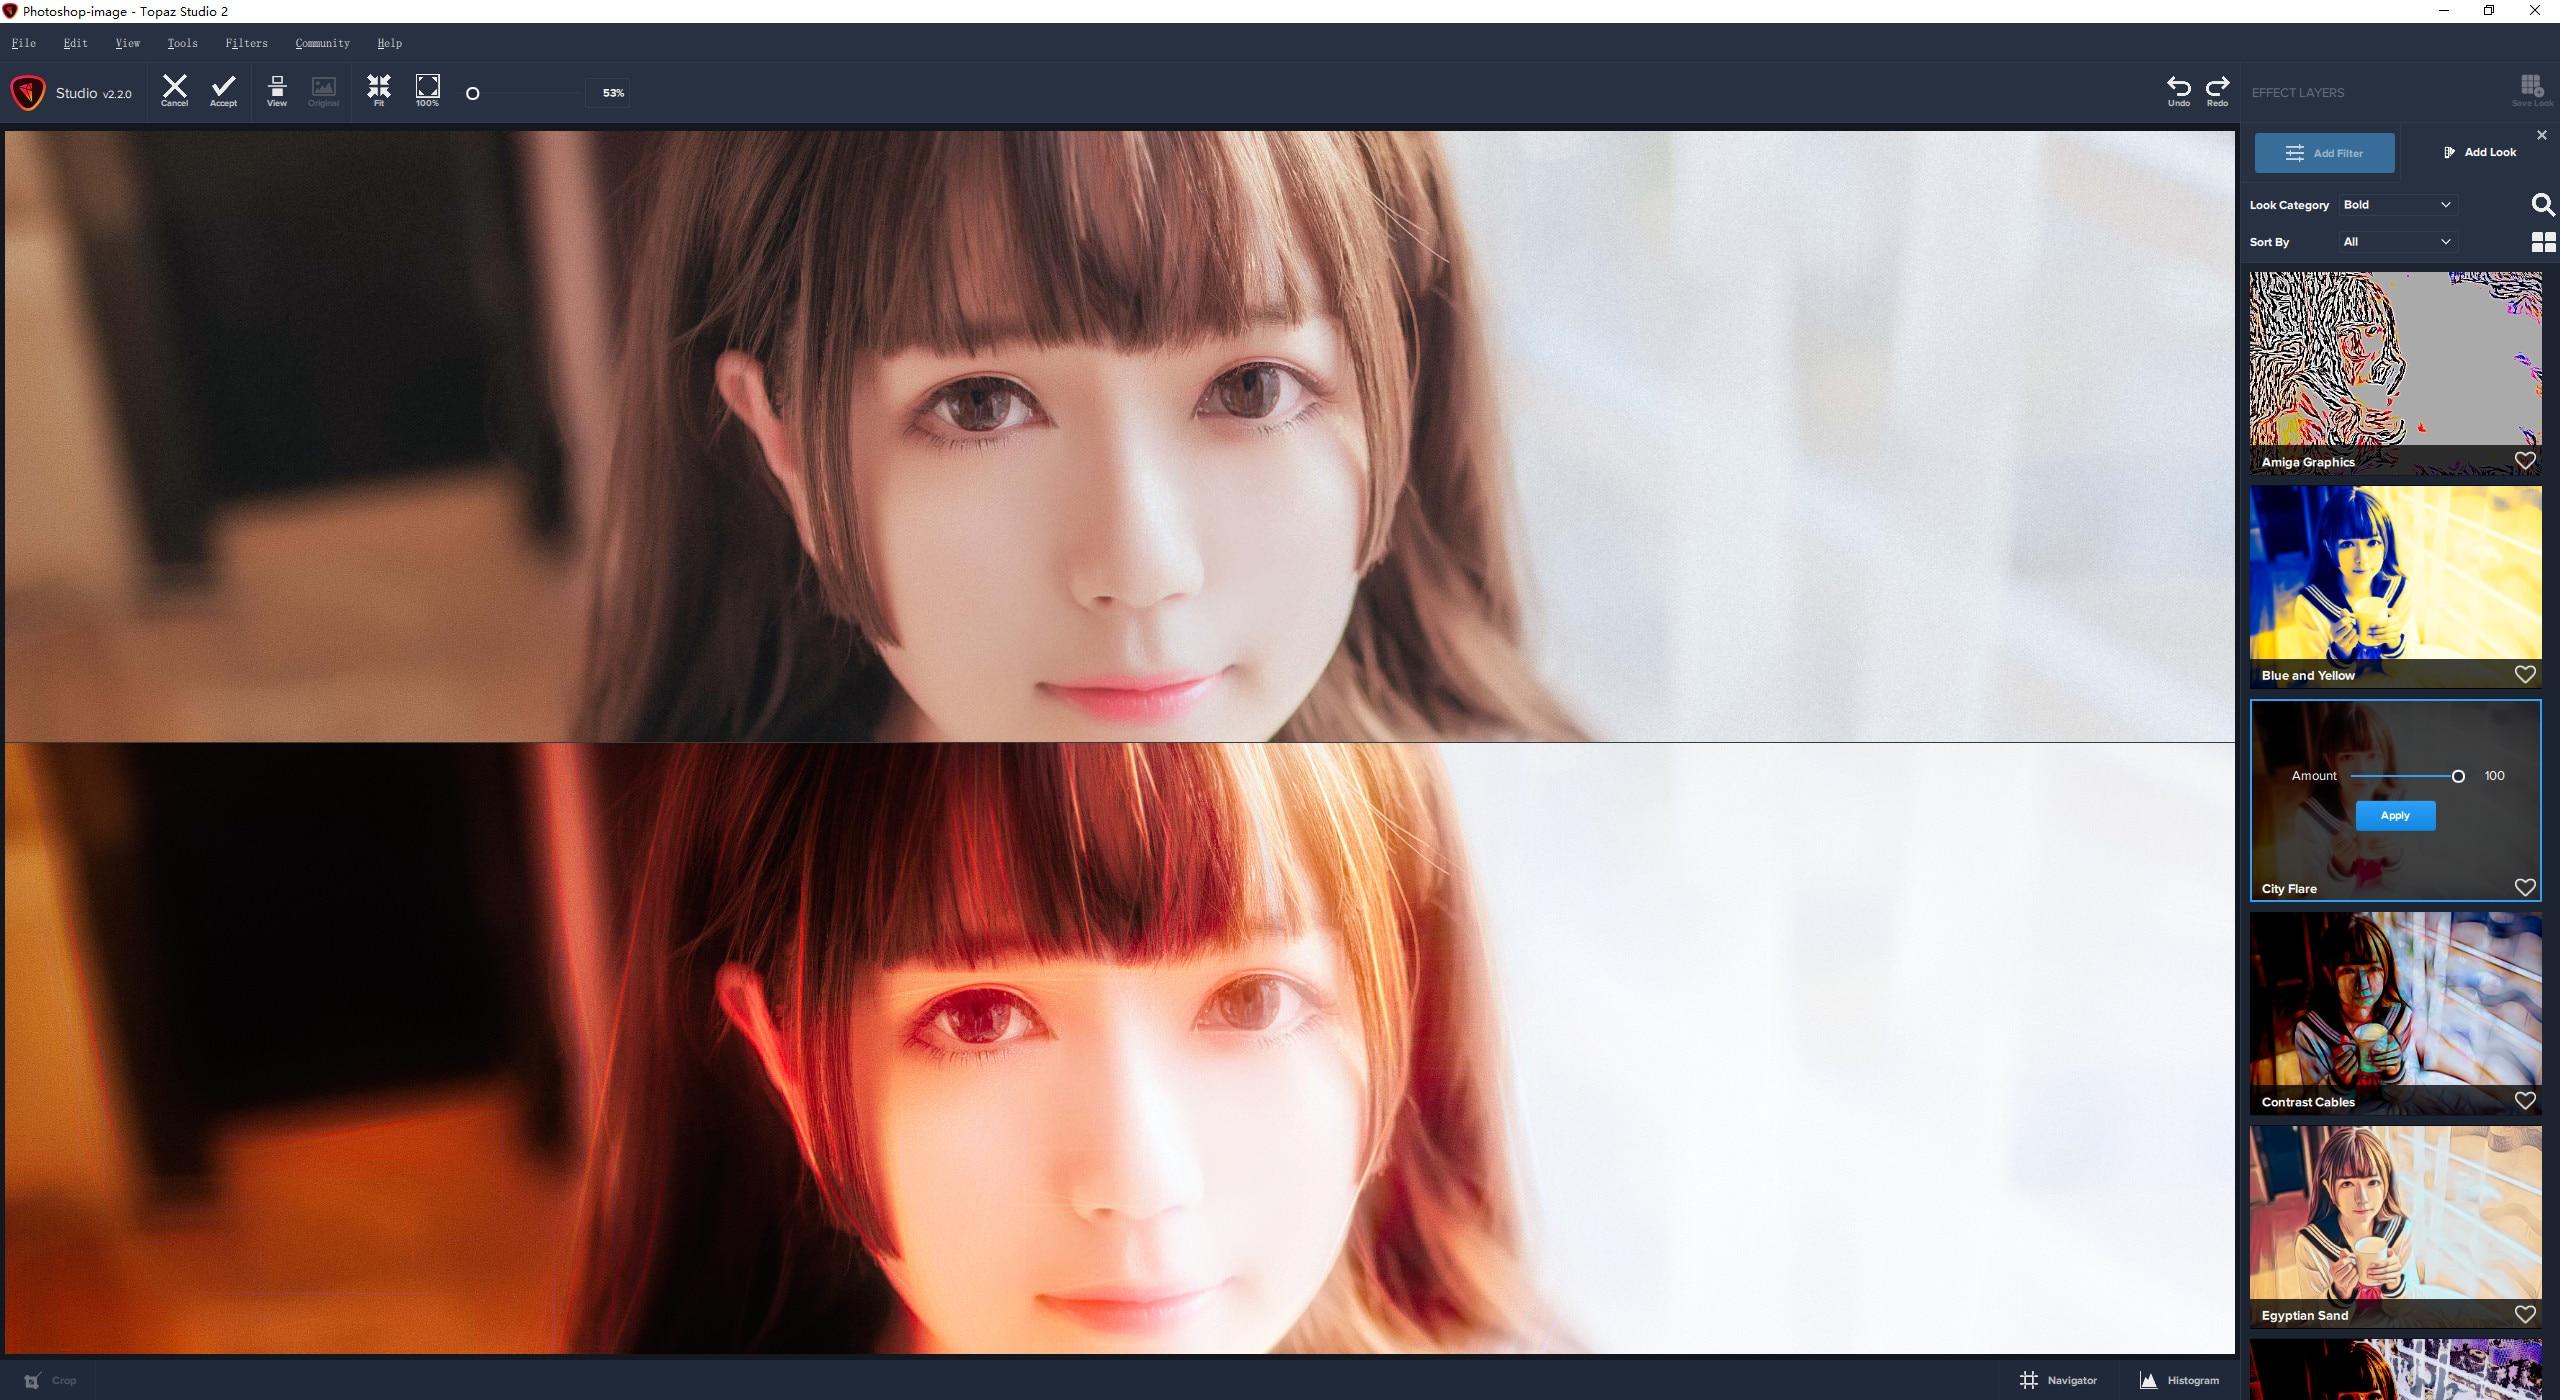 VIP资源-创意照片编辑软件 Topaz Studio 2.3.2 WIN 中文汉化版(6)